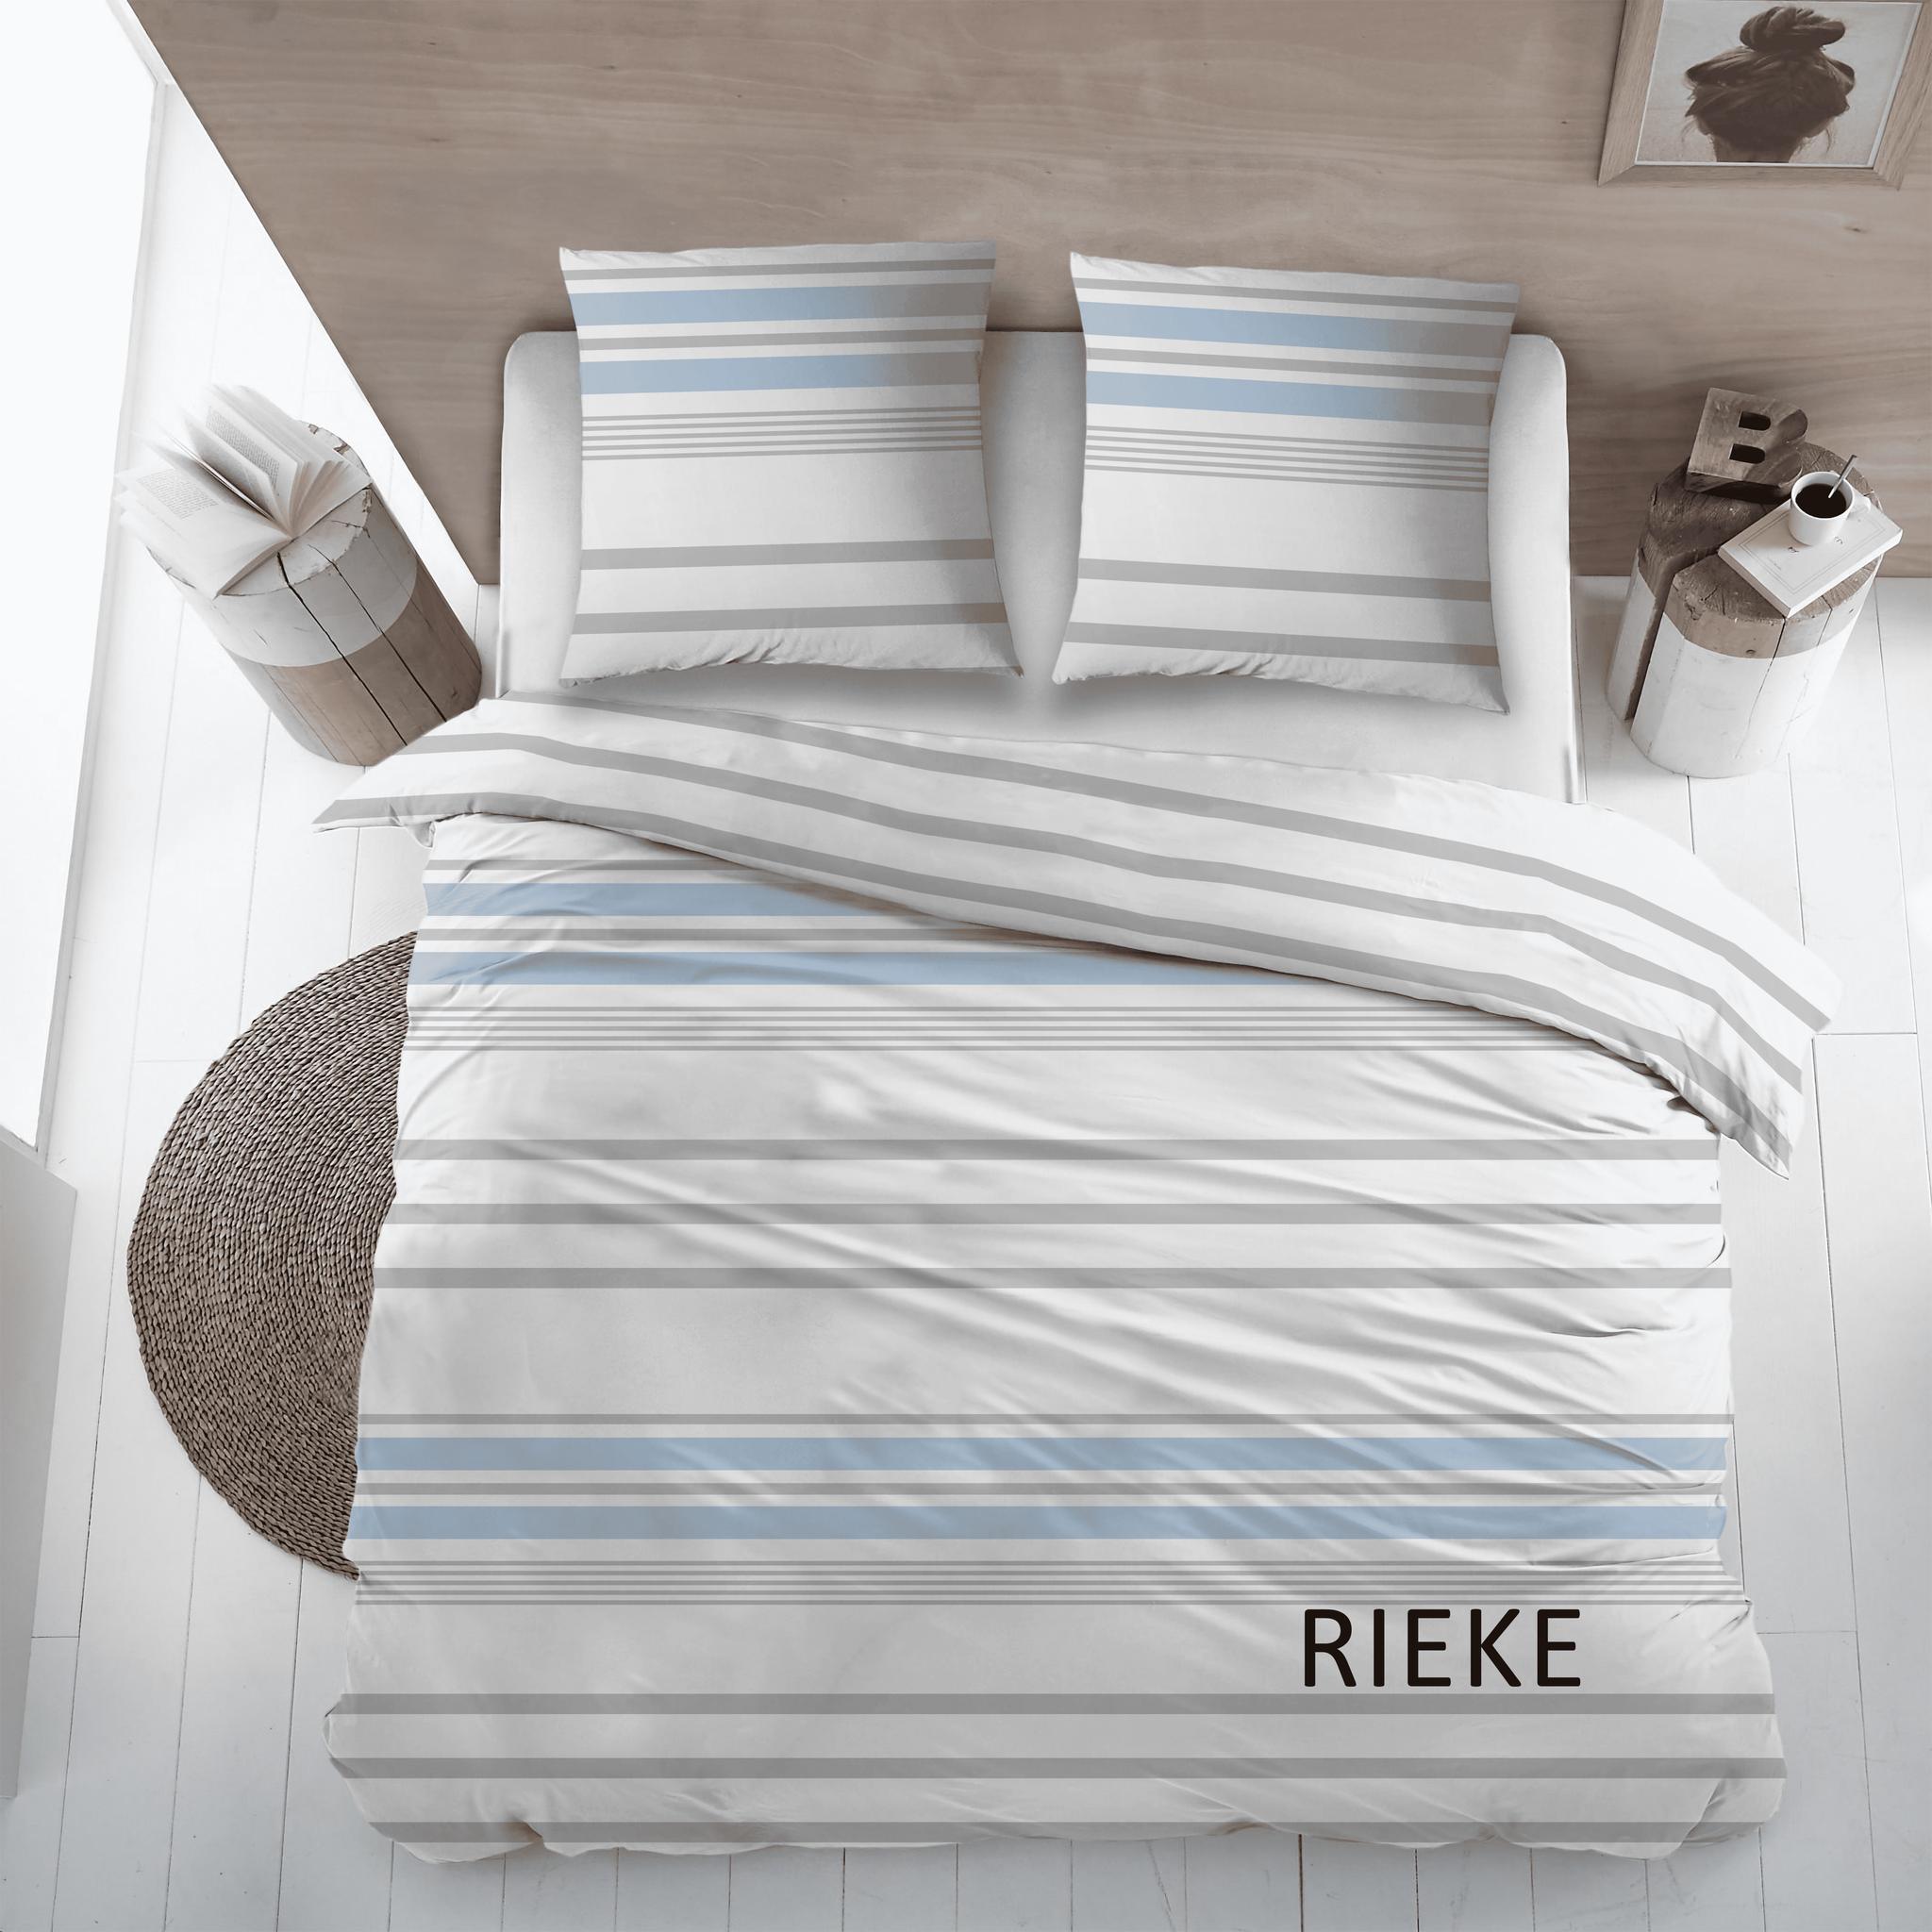 Cottons Dekbedovertrek Katoen Rieke Bleu